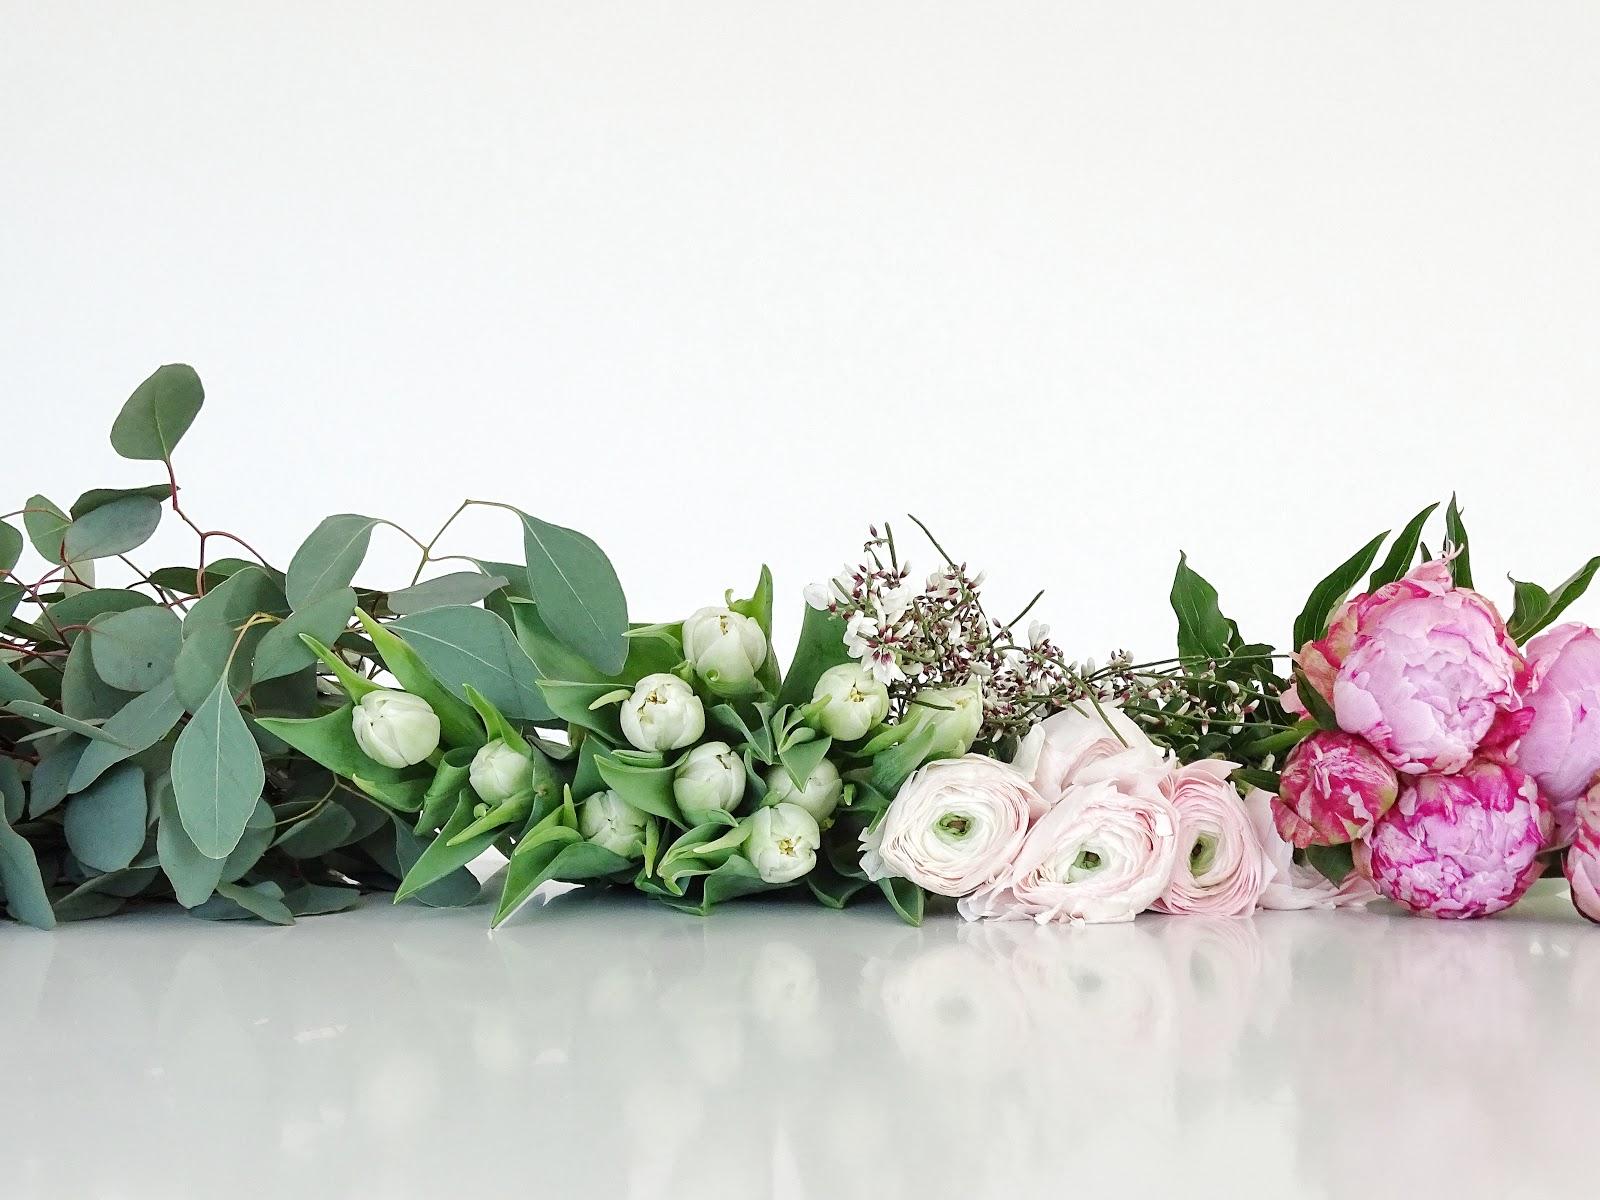 Frühlingsblumen: Ranunkeln, Pfingstrosen, Tulpen und Eukalyptus | Fotoaktion #12von12 und 1 Tag in 12 Bildern | https://mammilade.blogspot.de